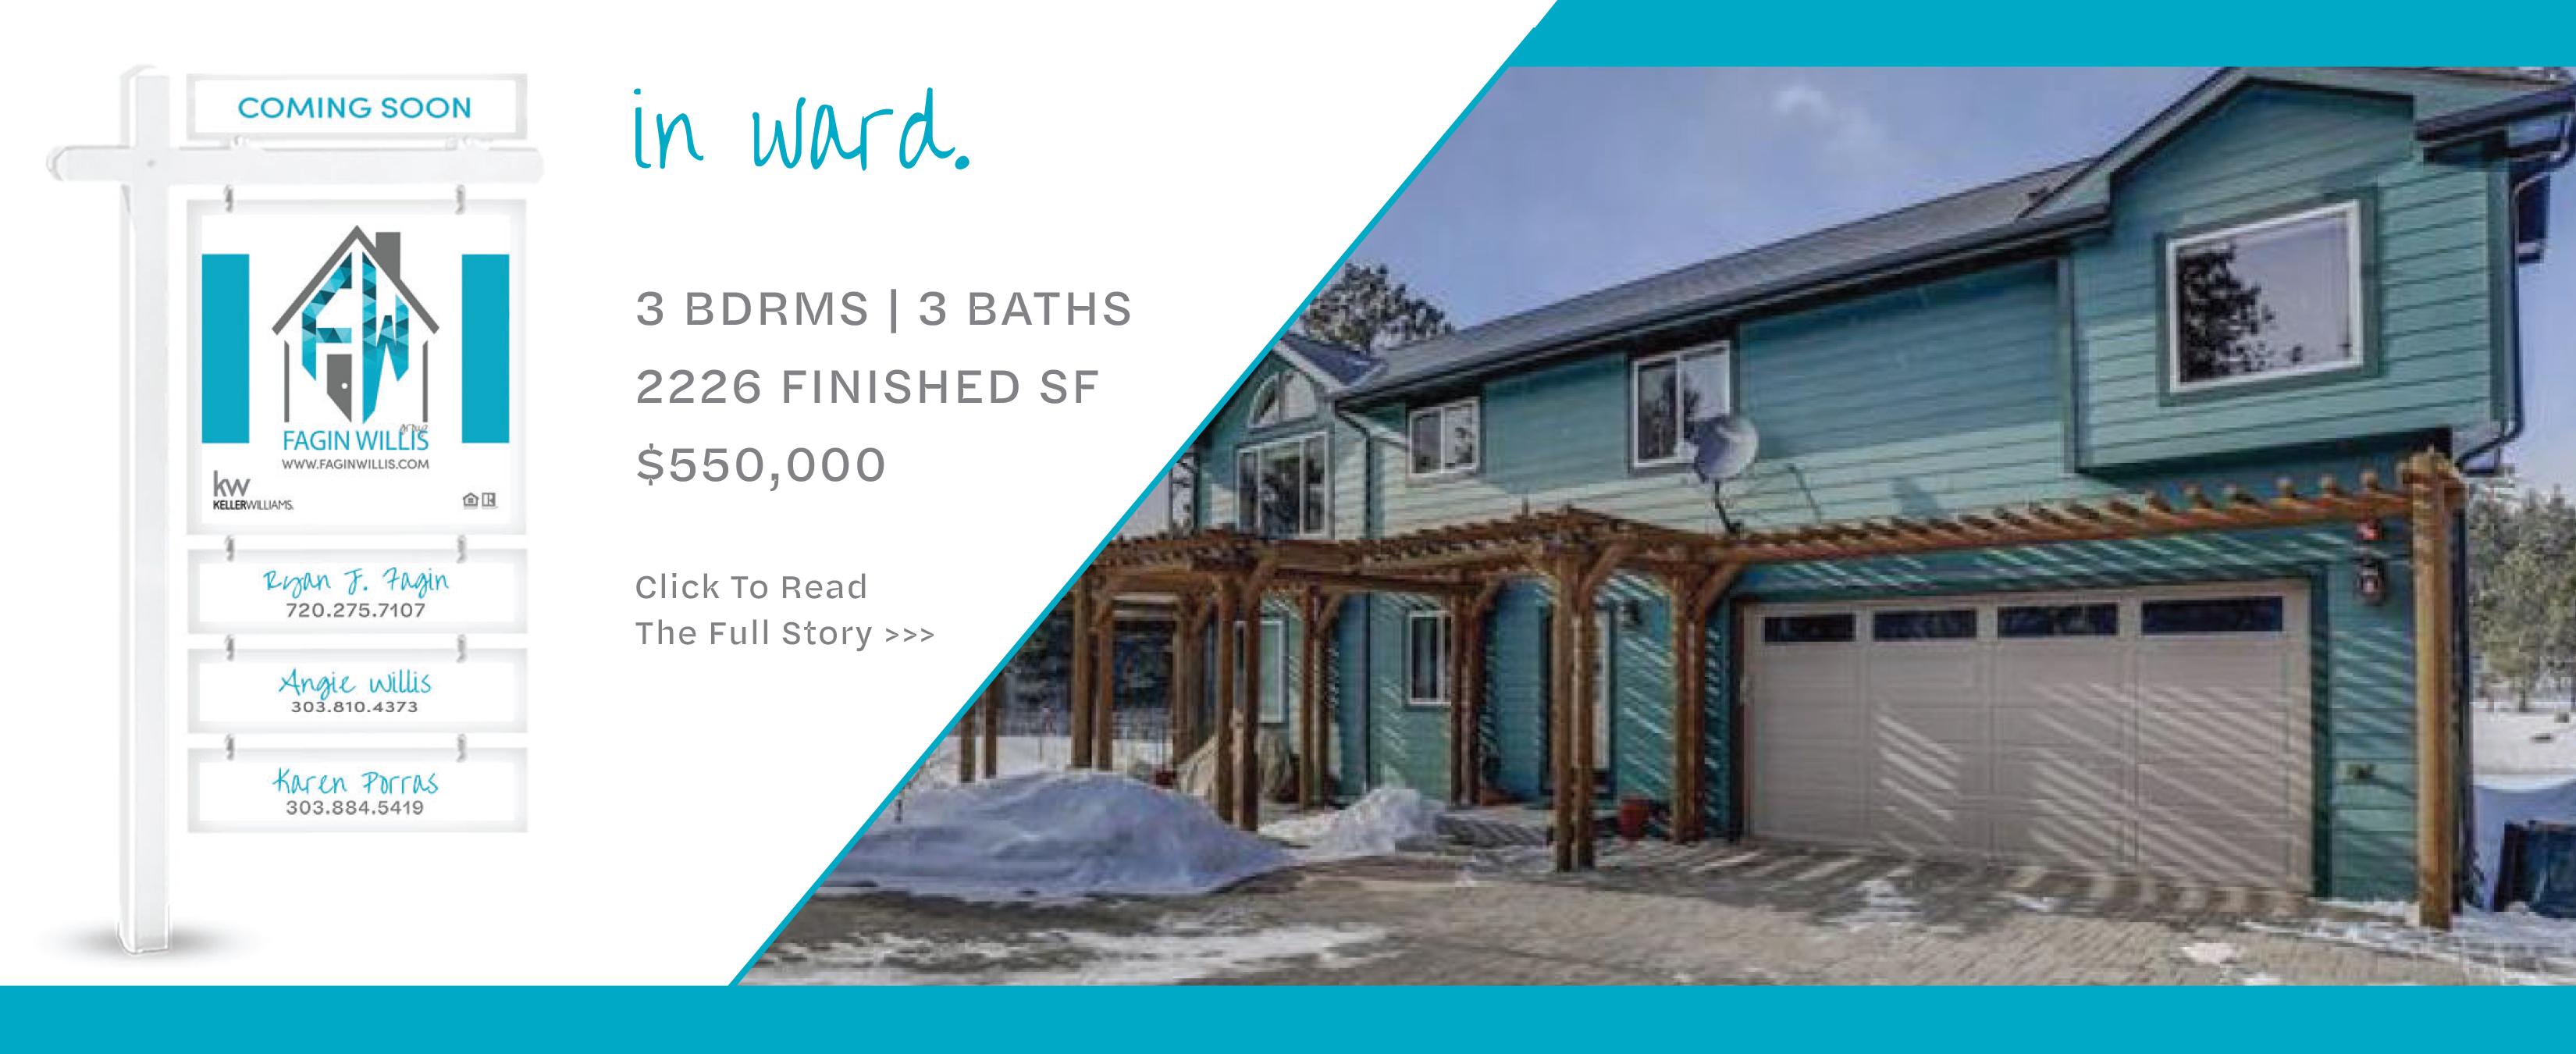 55 High Lake Road | Ward | Fagin Willis Group